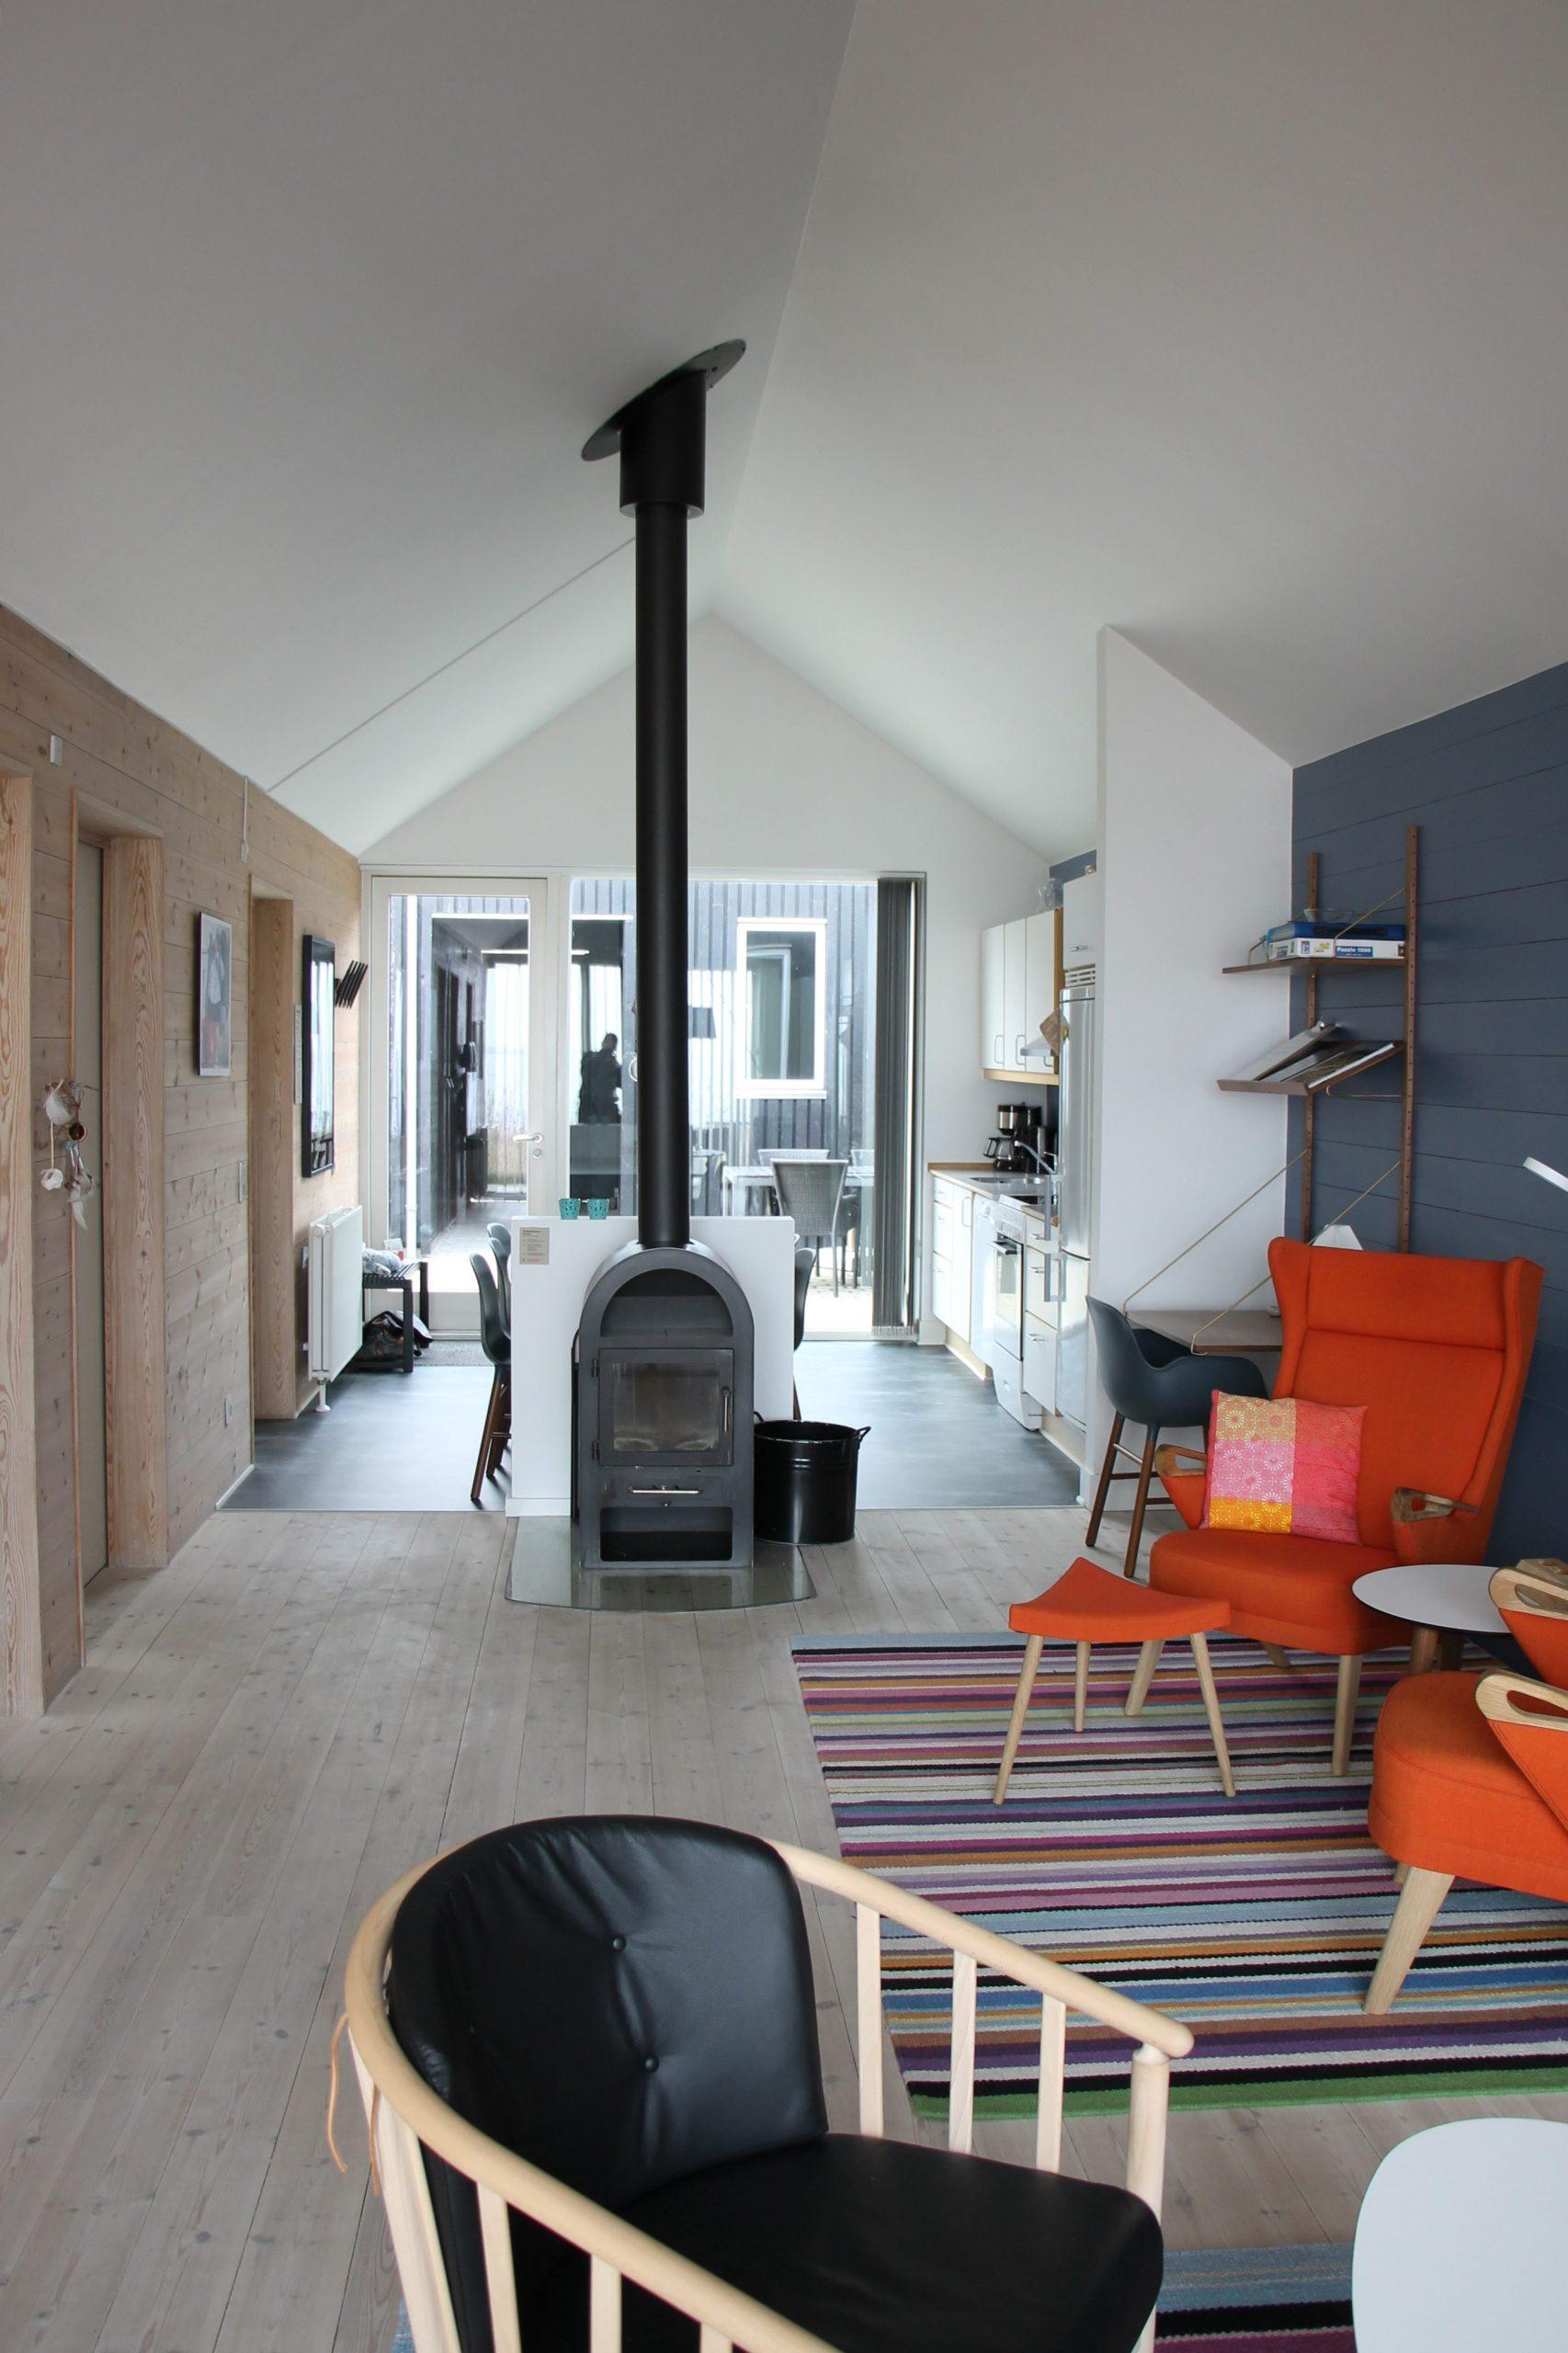 modernes Ferienhaus Dänemark   Lavendelblog